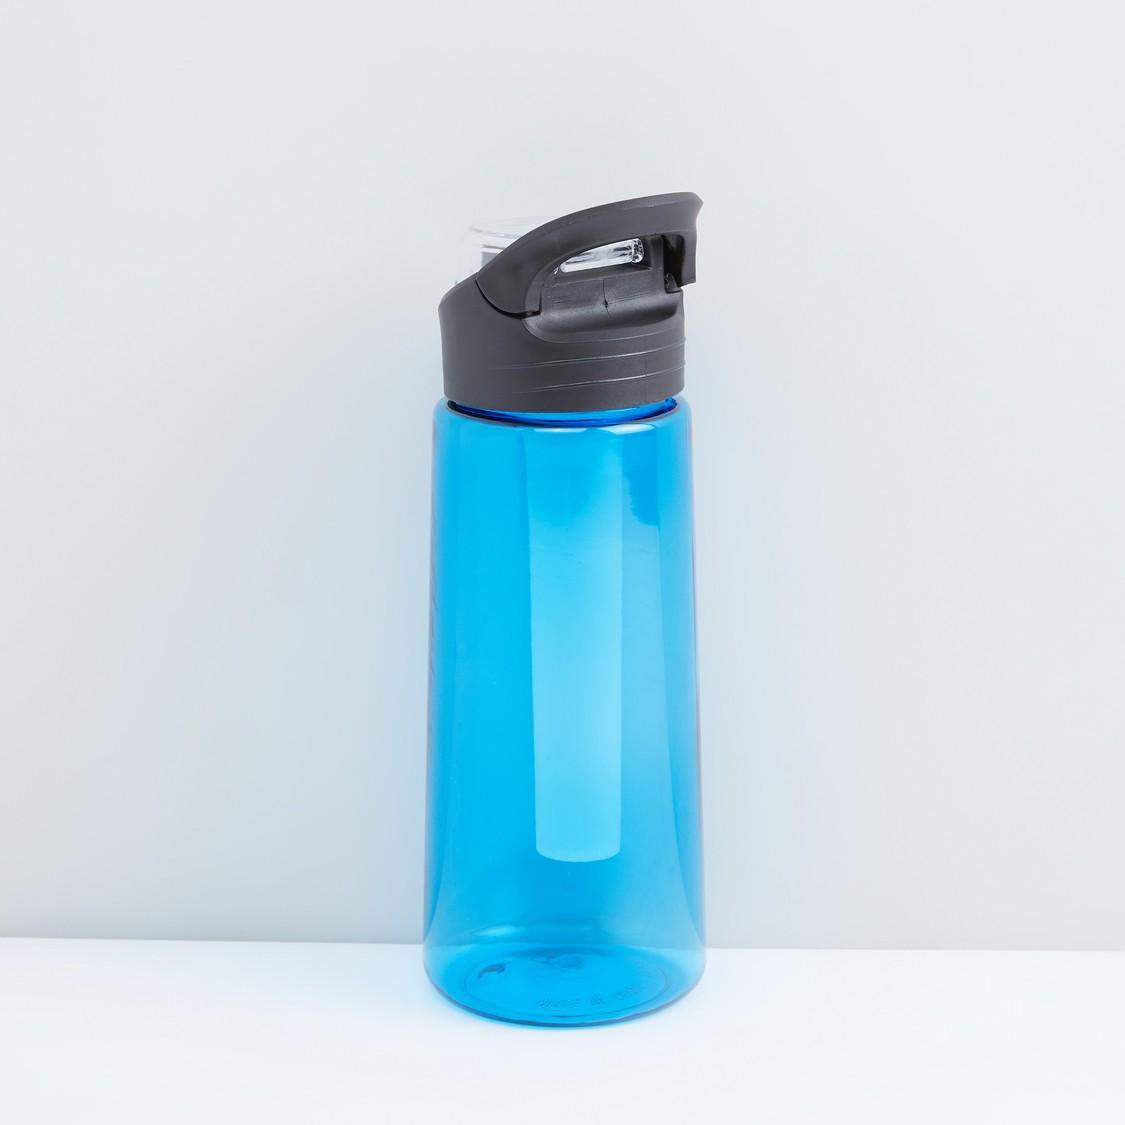 Flip Top Water Bottle with Freezer Stick - 650 ml